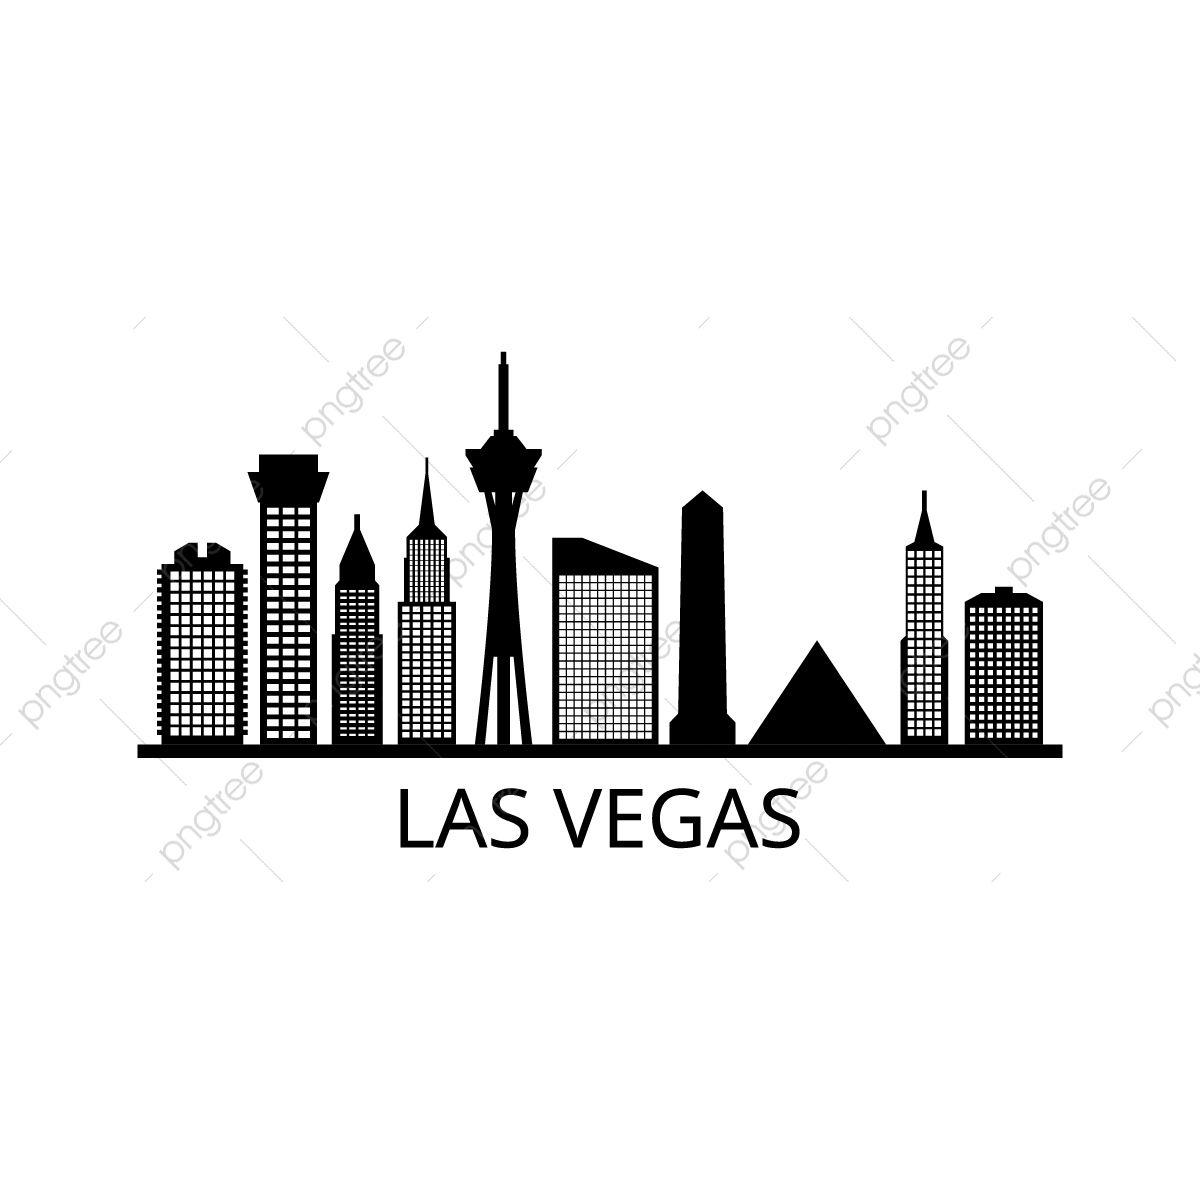 Skyline Clipart Ideas In 2021 City Skyline Silhouette City Silhouette City Vector